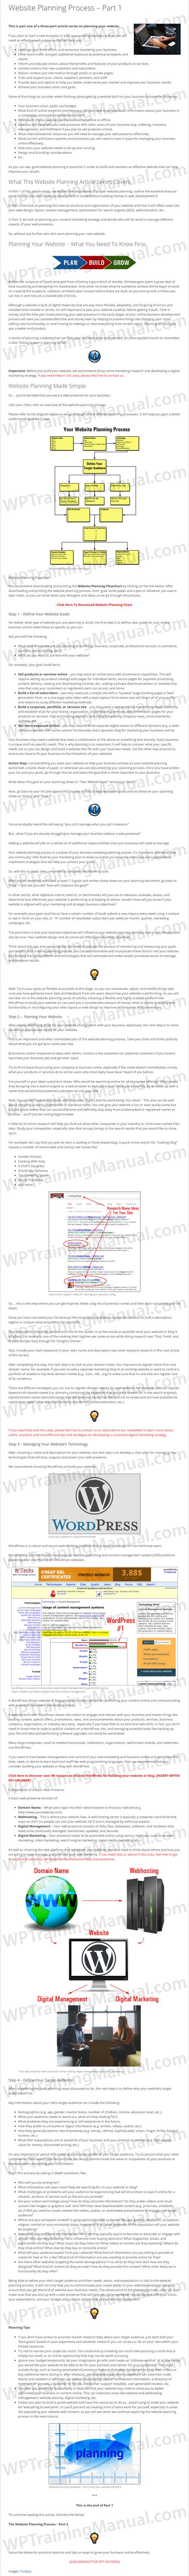 Tutorial: How To Plan Your Website - Part 1 - WPTrainingManual.com